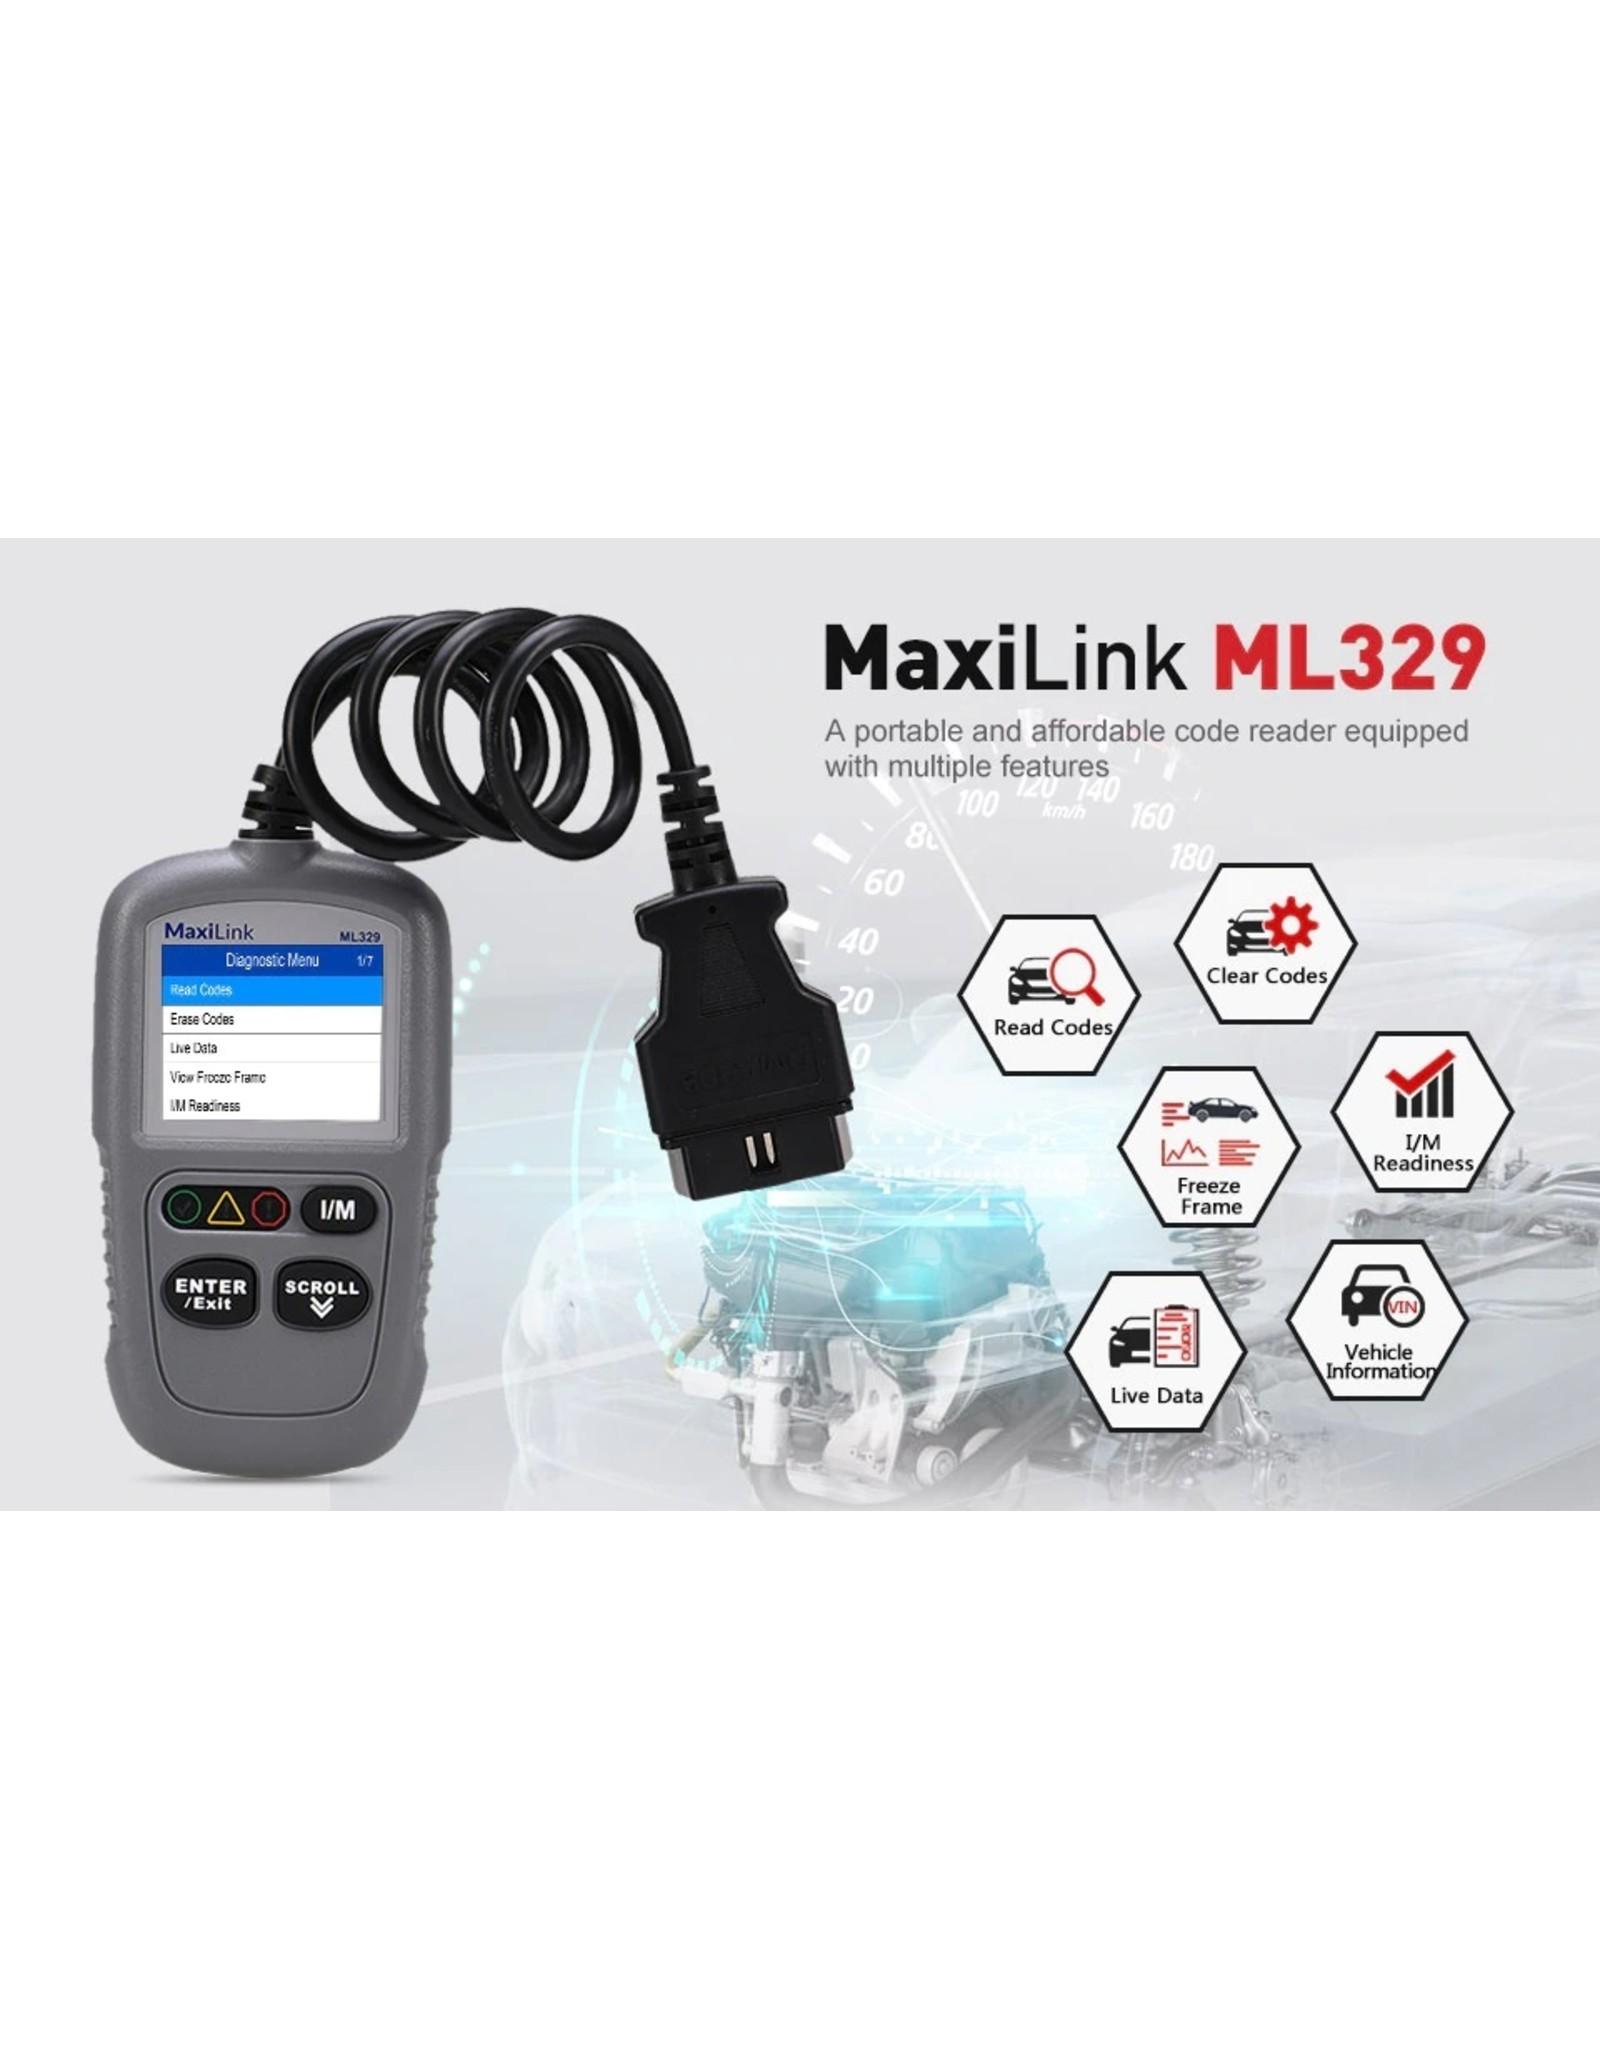 Autel MaxiLink ML329 Code Reader Een Klik I/M Readiness Professionele Scanner Sleutel AutoVIN Functie OBDII Auto Diagnostische hulpmiddel